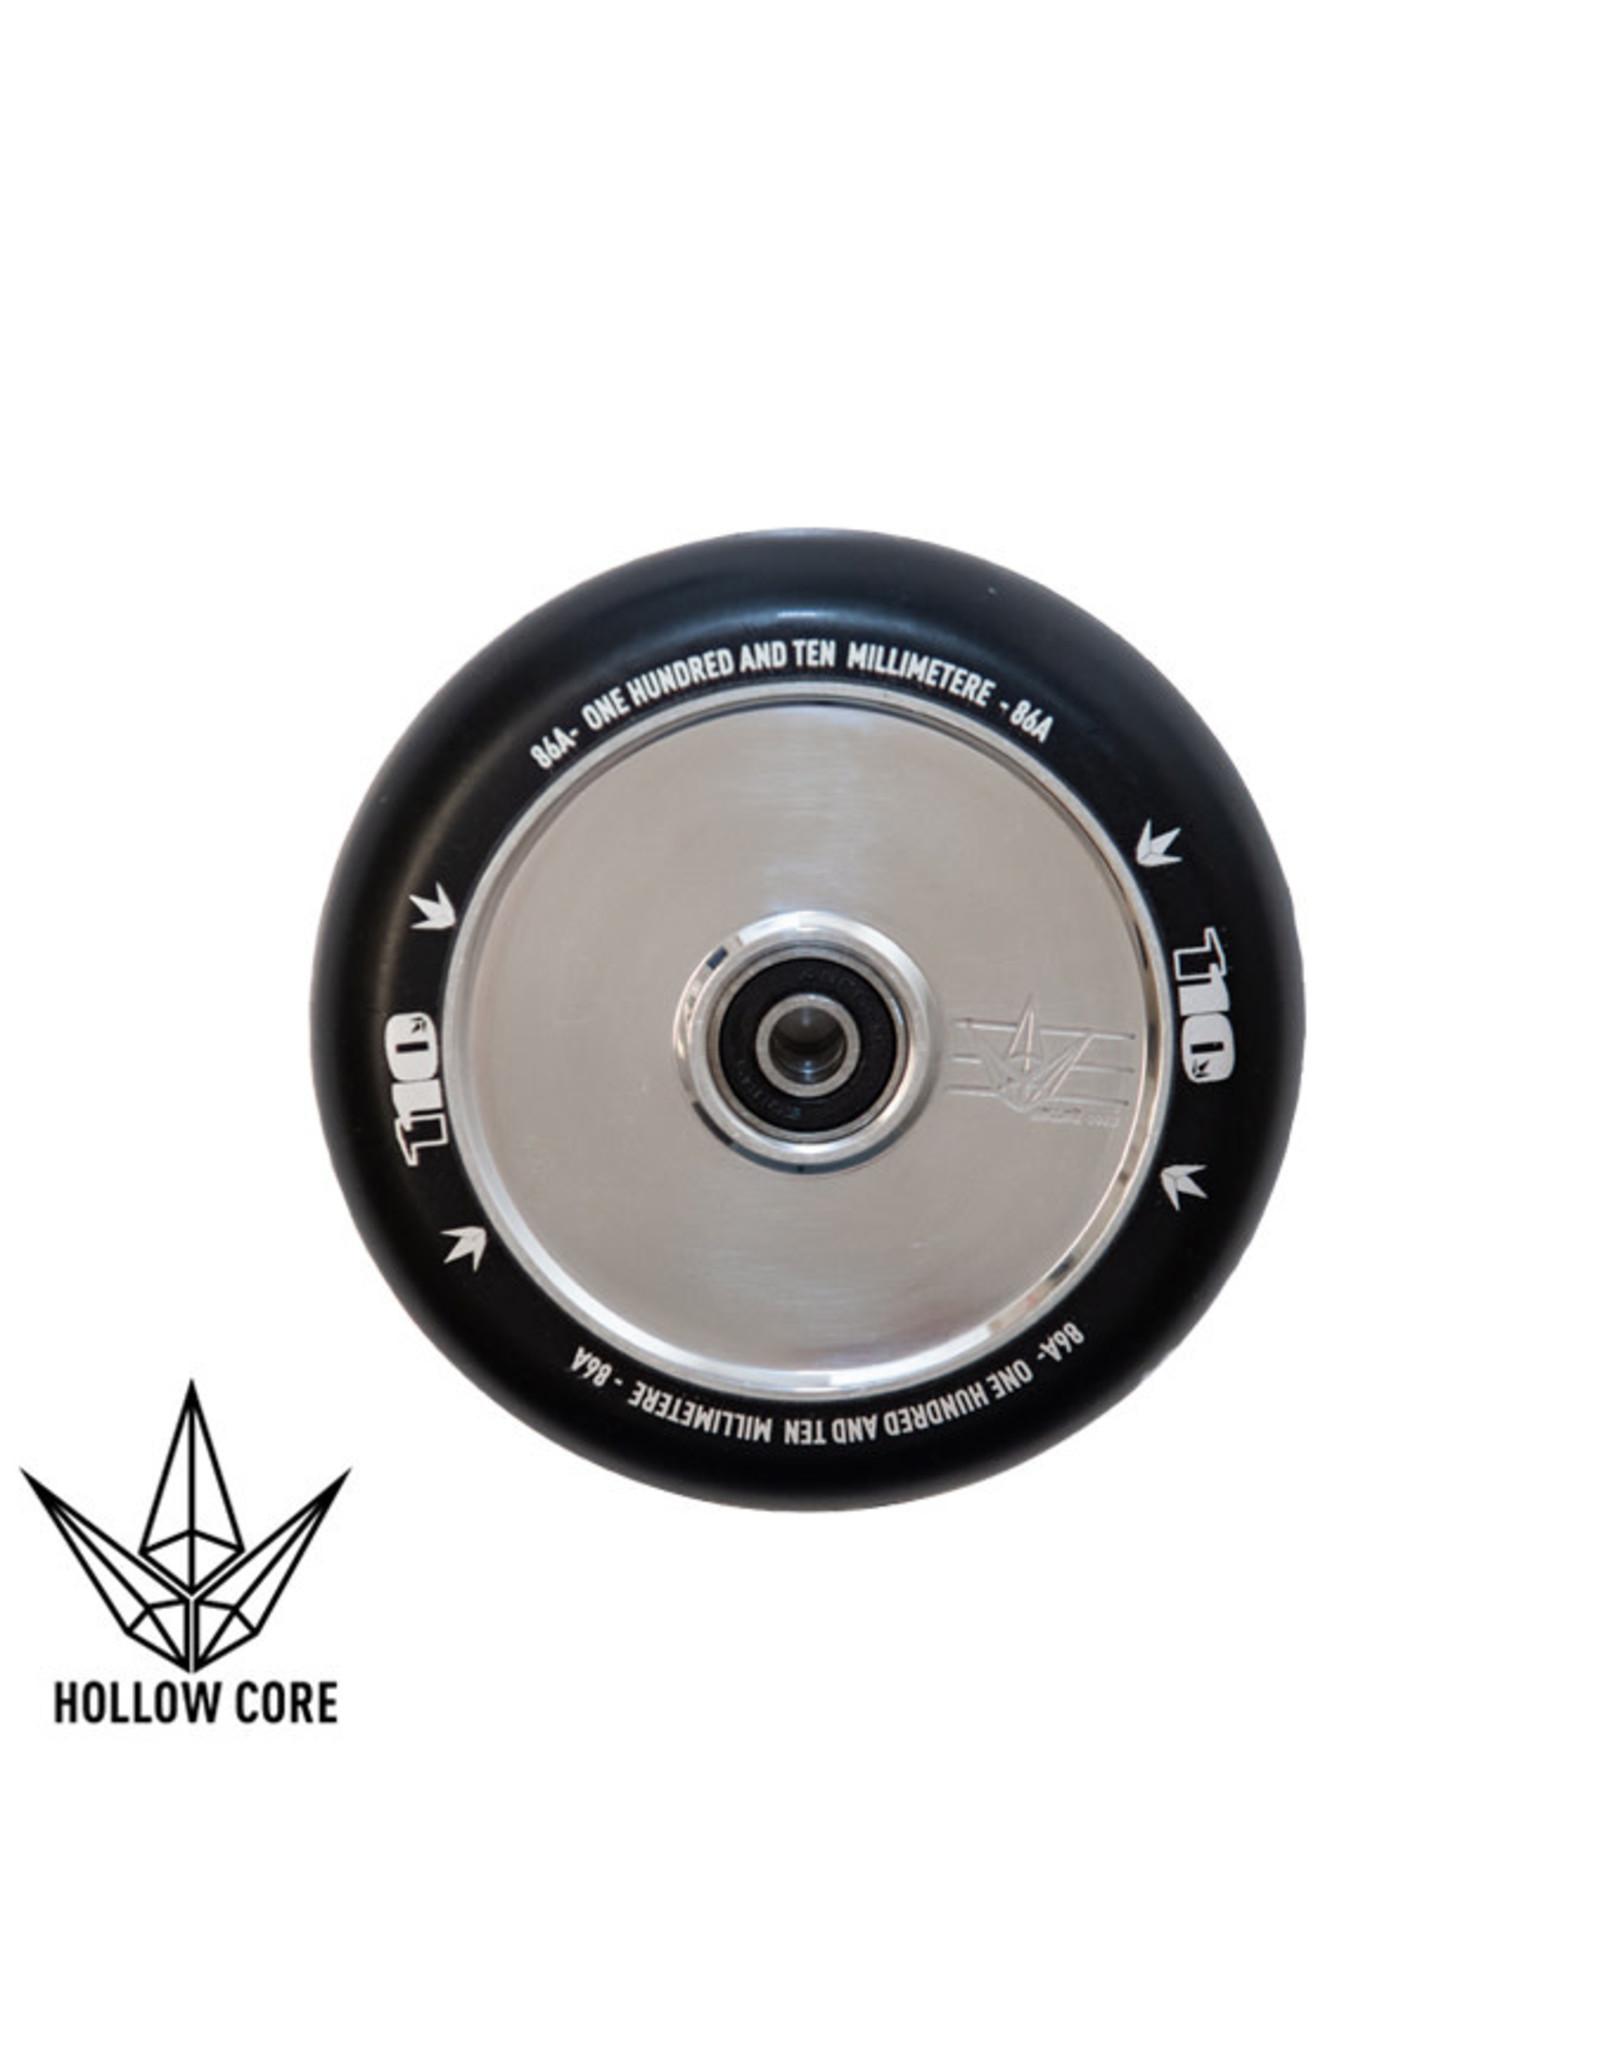 ENVY Envy Hollow Core Scooter Wheel 110mm